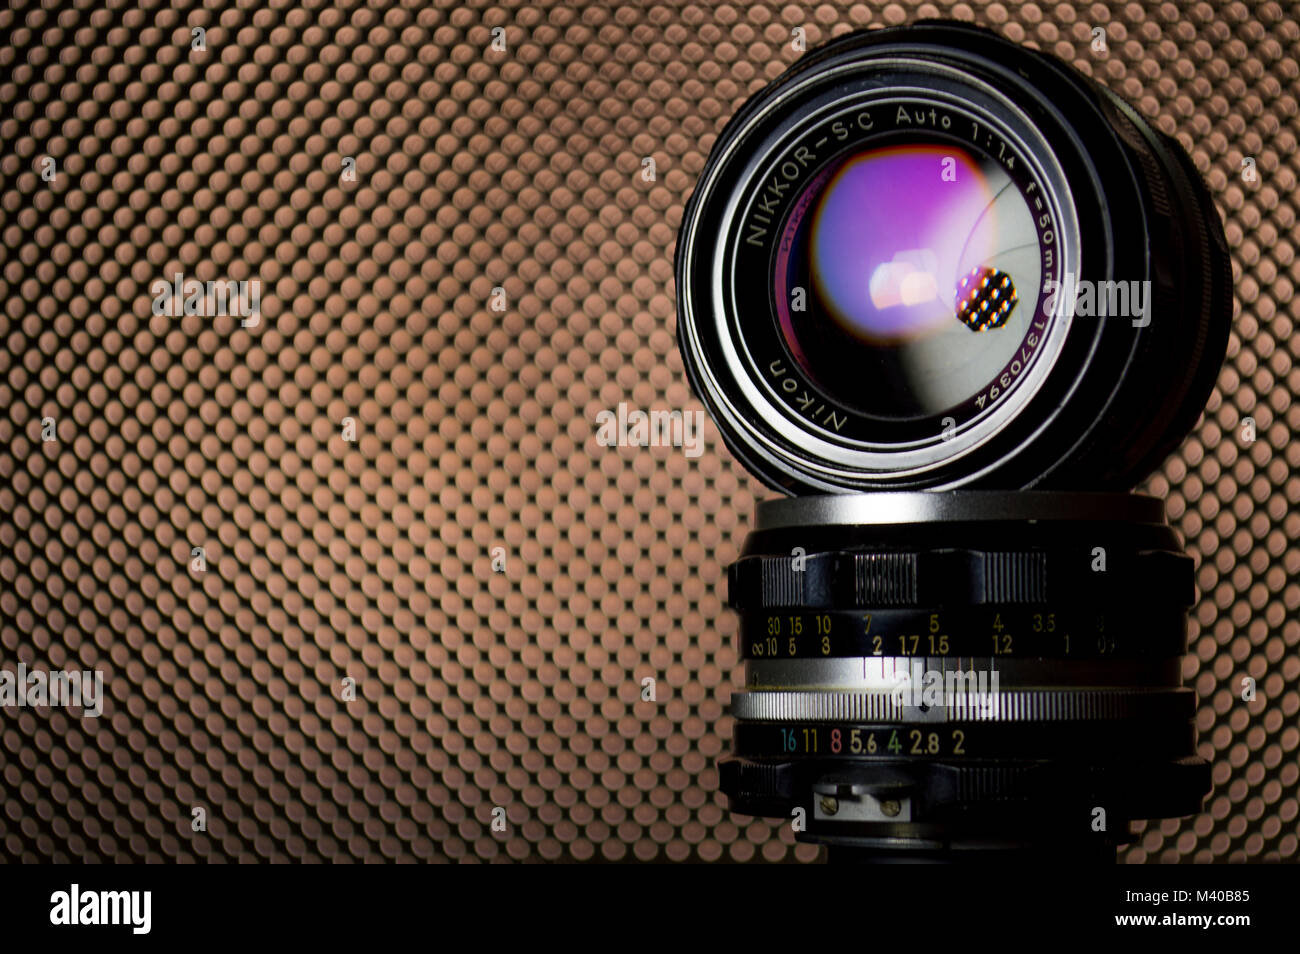 nikon lens - Stock Image